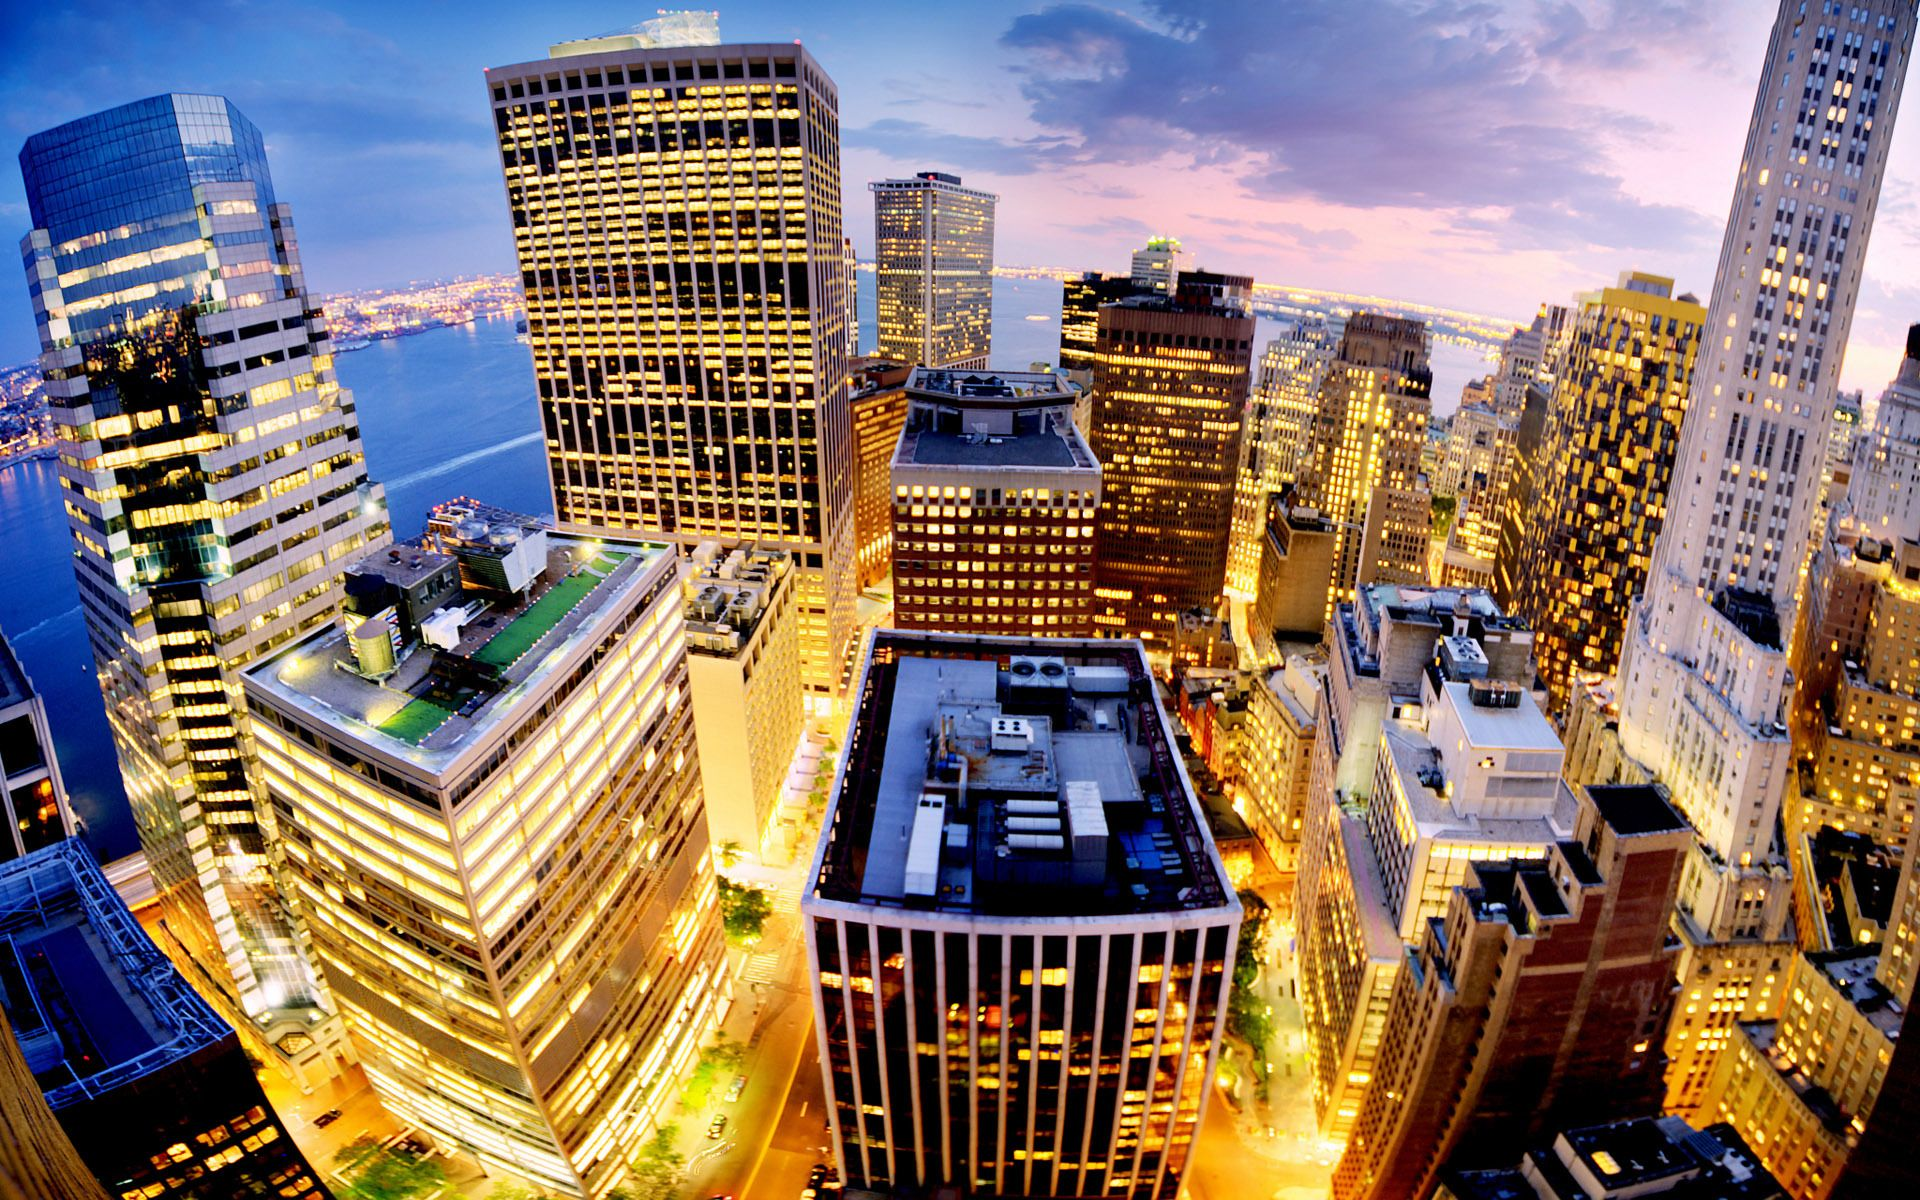 Hd wallpaper city - City Wallpaper Hd Background Wallpaper City Hd Wallpapers P City Wallpapers Hd Wallpapers